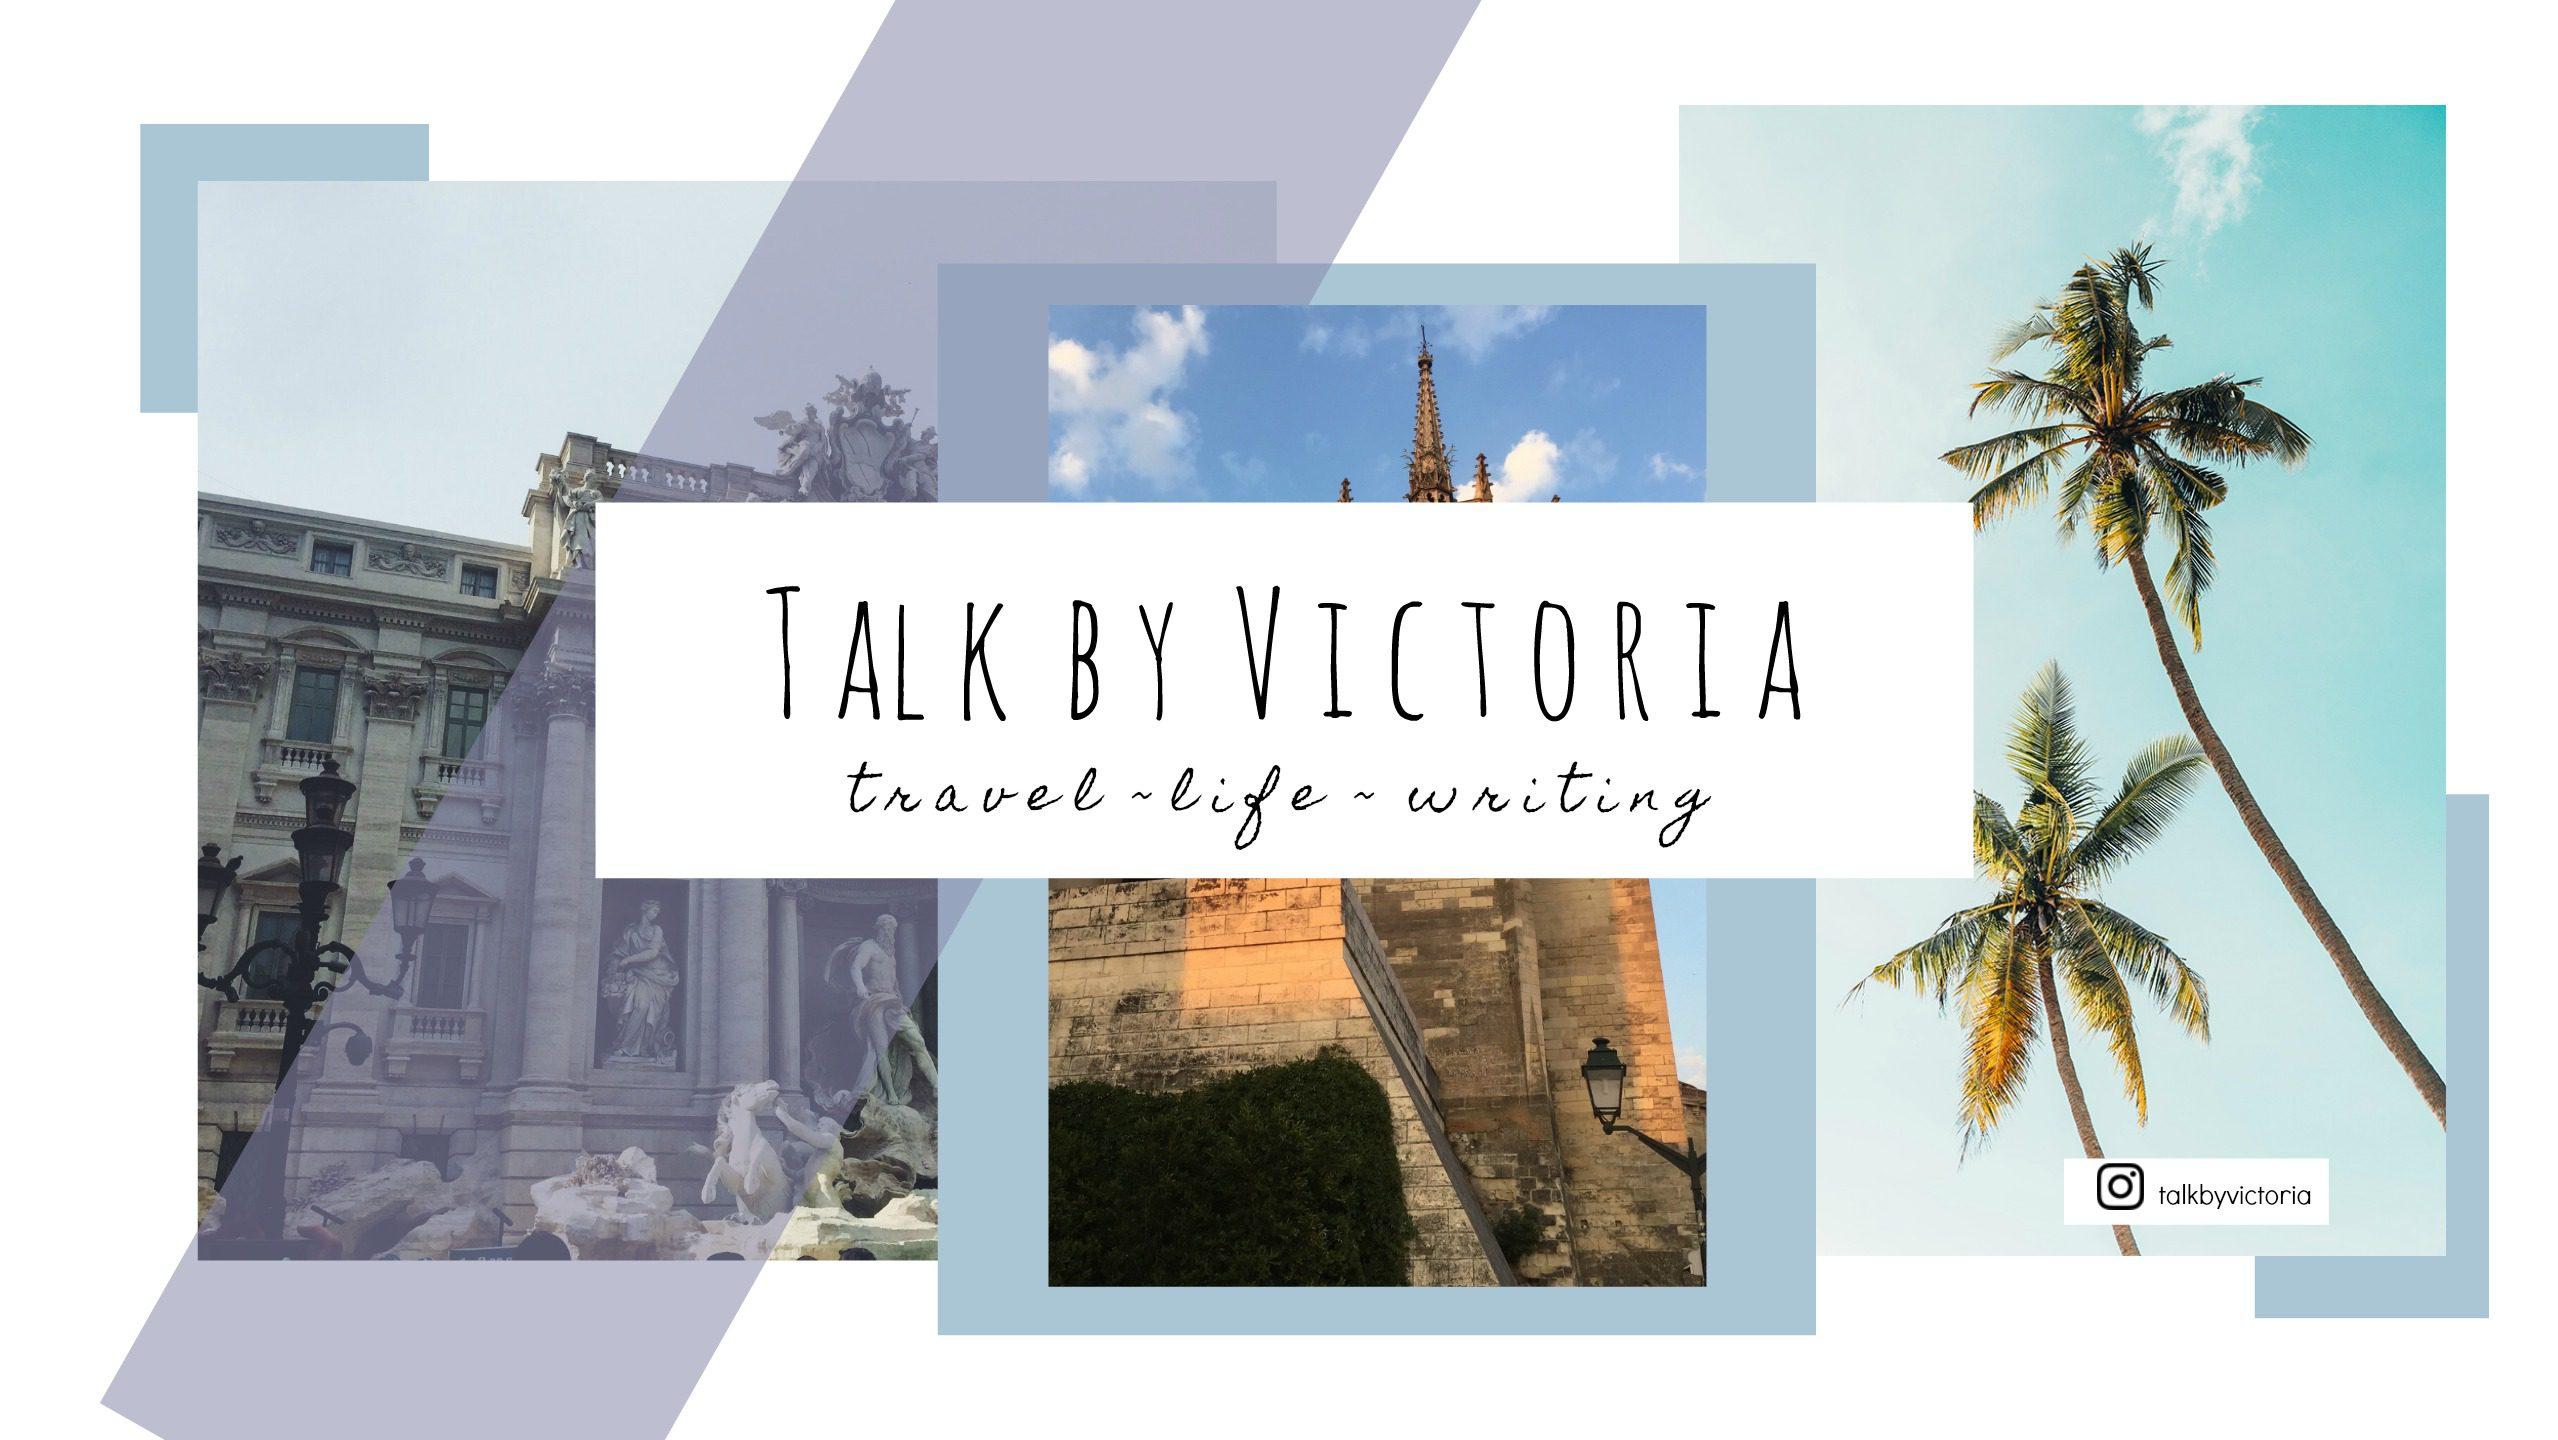 Talk by Victoria